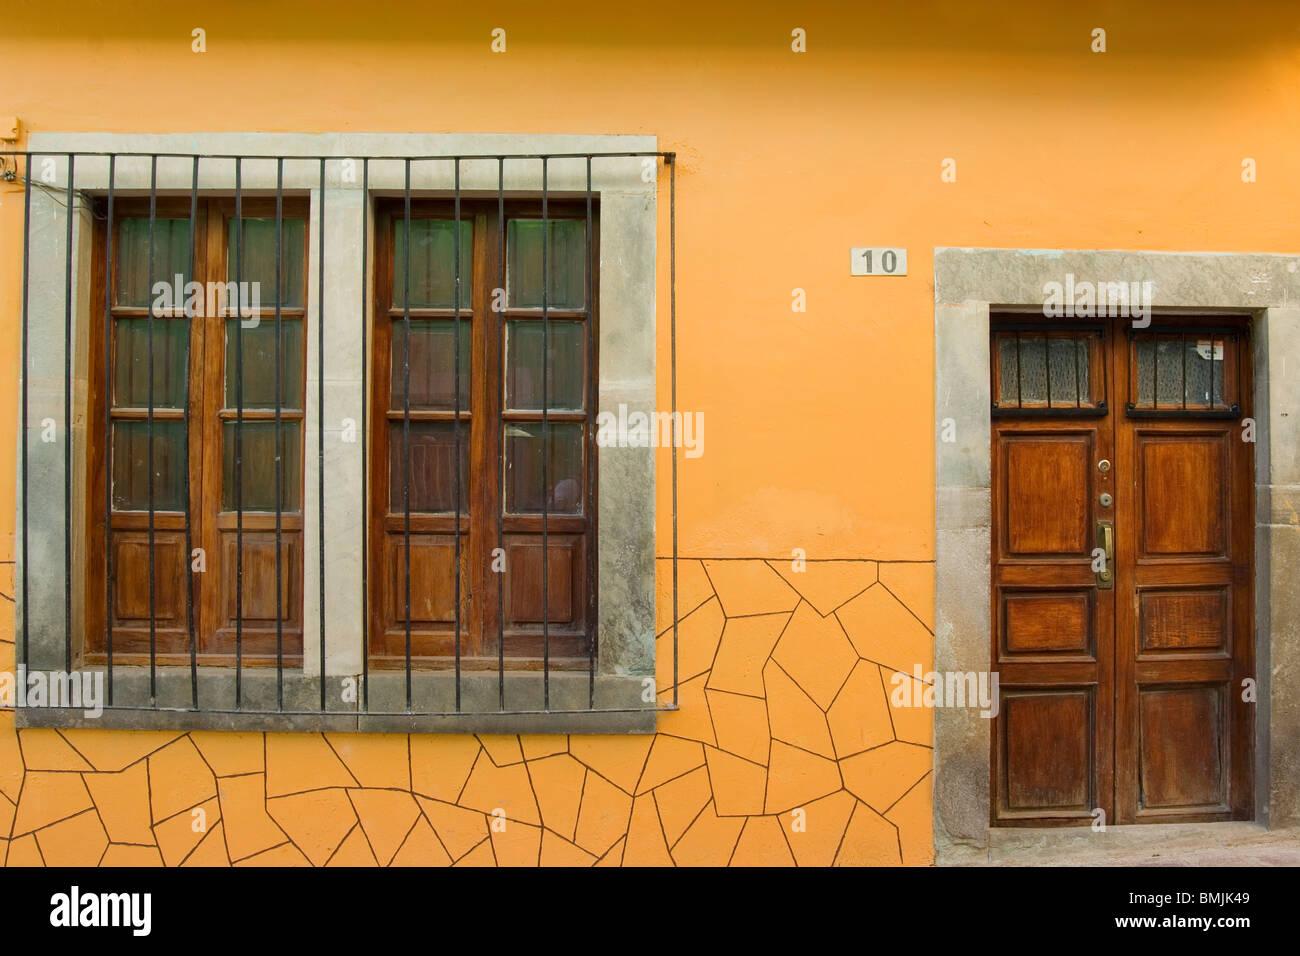 Historic town of Guanajuato, Doors and windows, Province of Guanajuato, Mexico Stock Photo